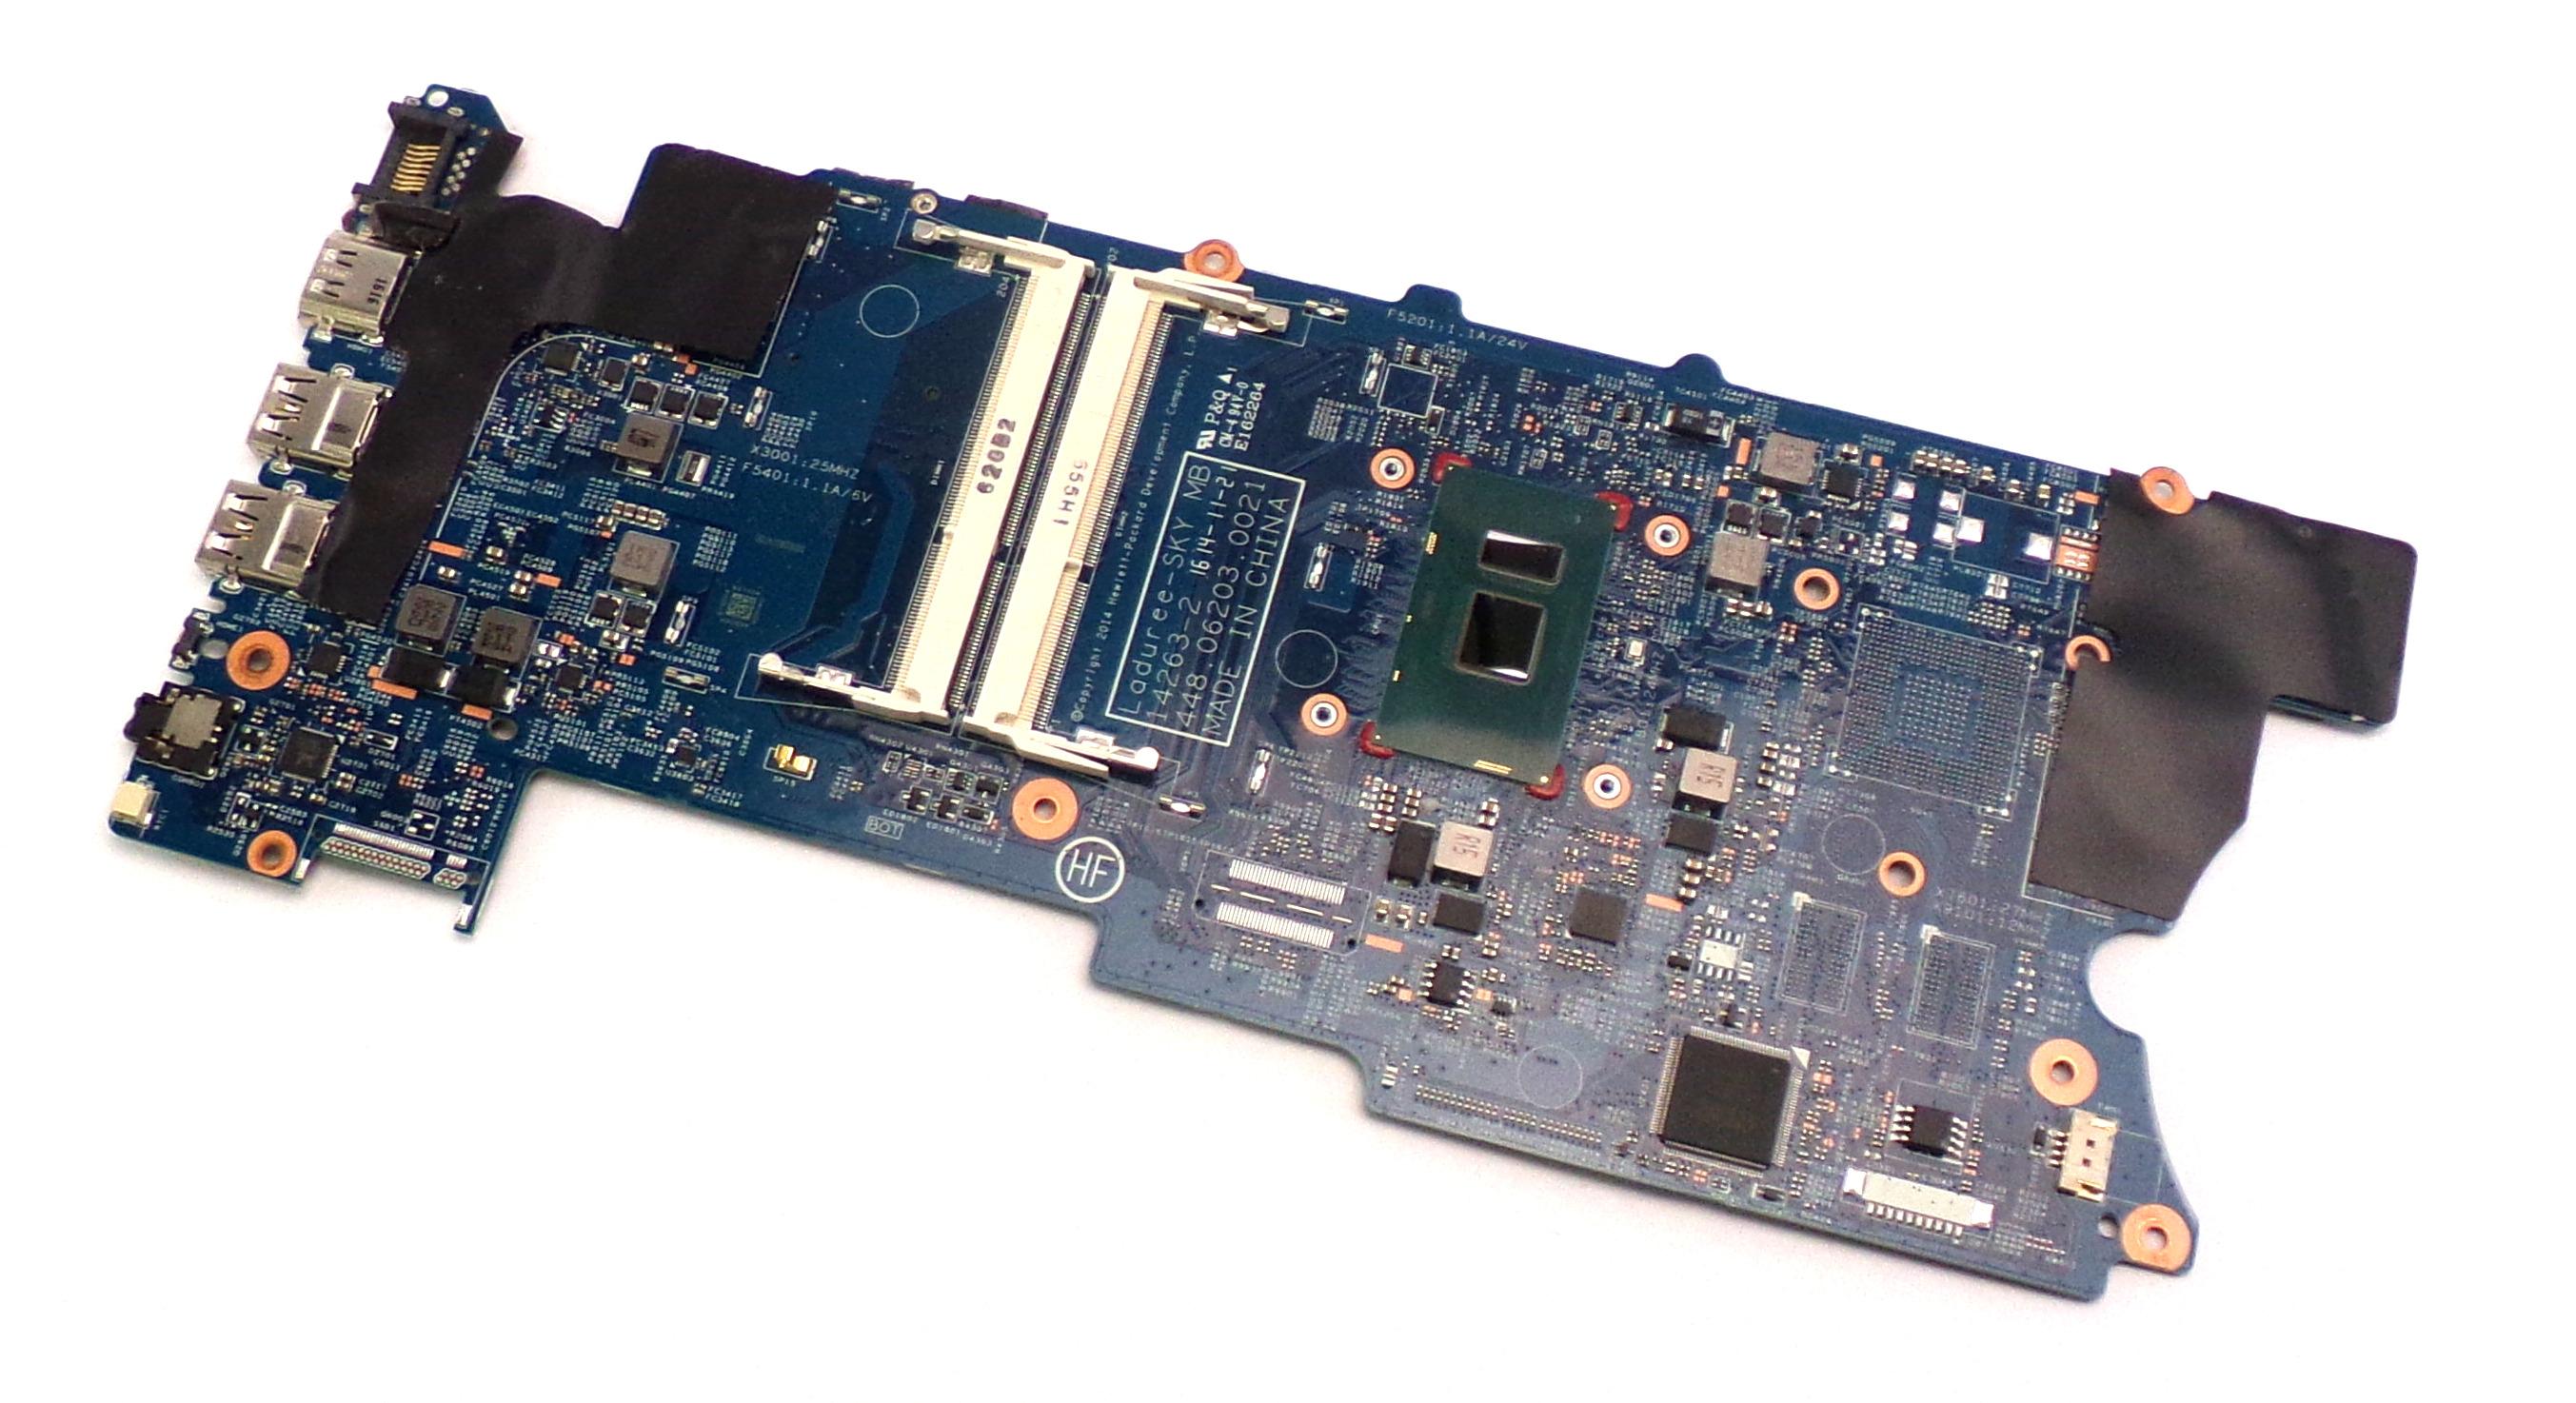 HP 860592-601 Pavilion x360 15-BK Motherboard with Intel Core i3-6100U CPU